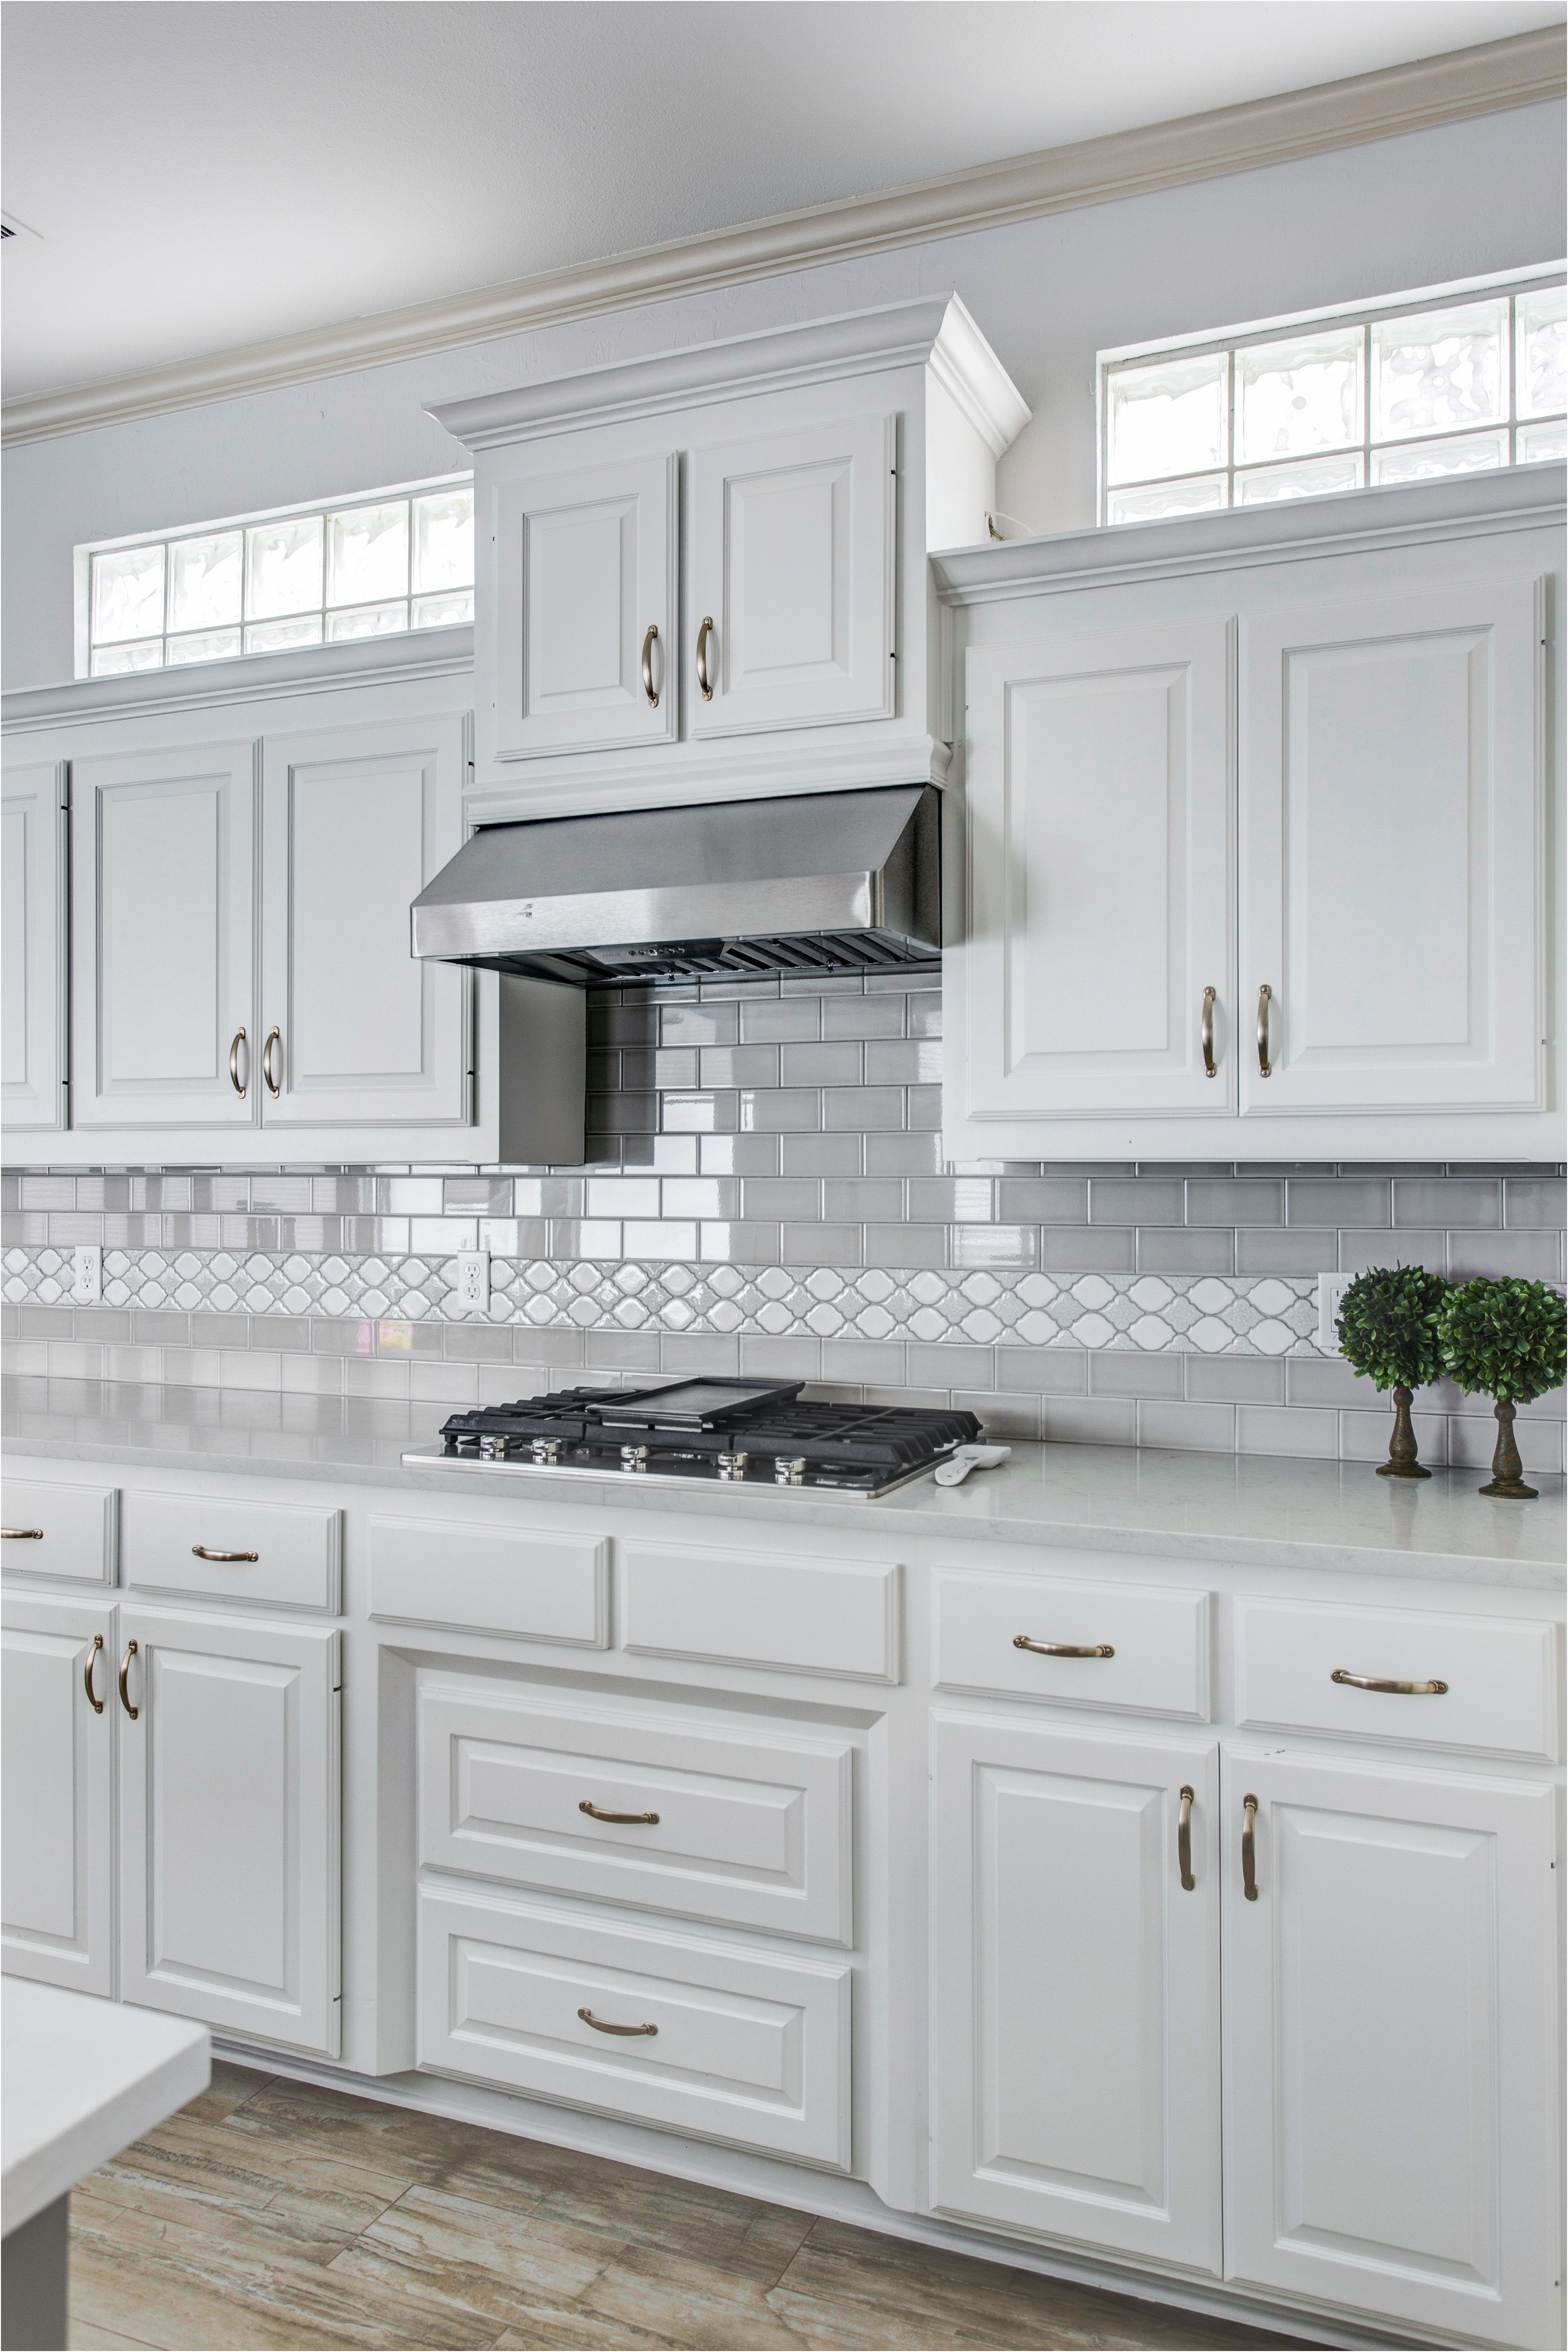 8 Calm Grey and White Kitchen Backsplash Gallery